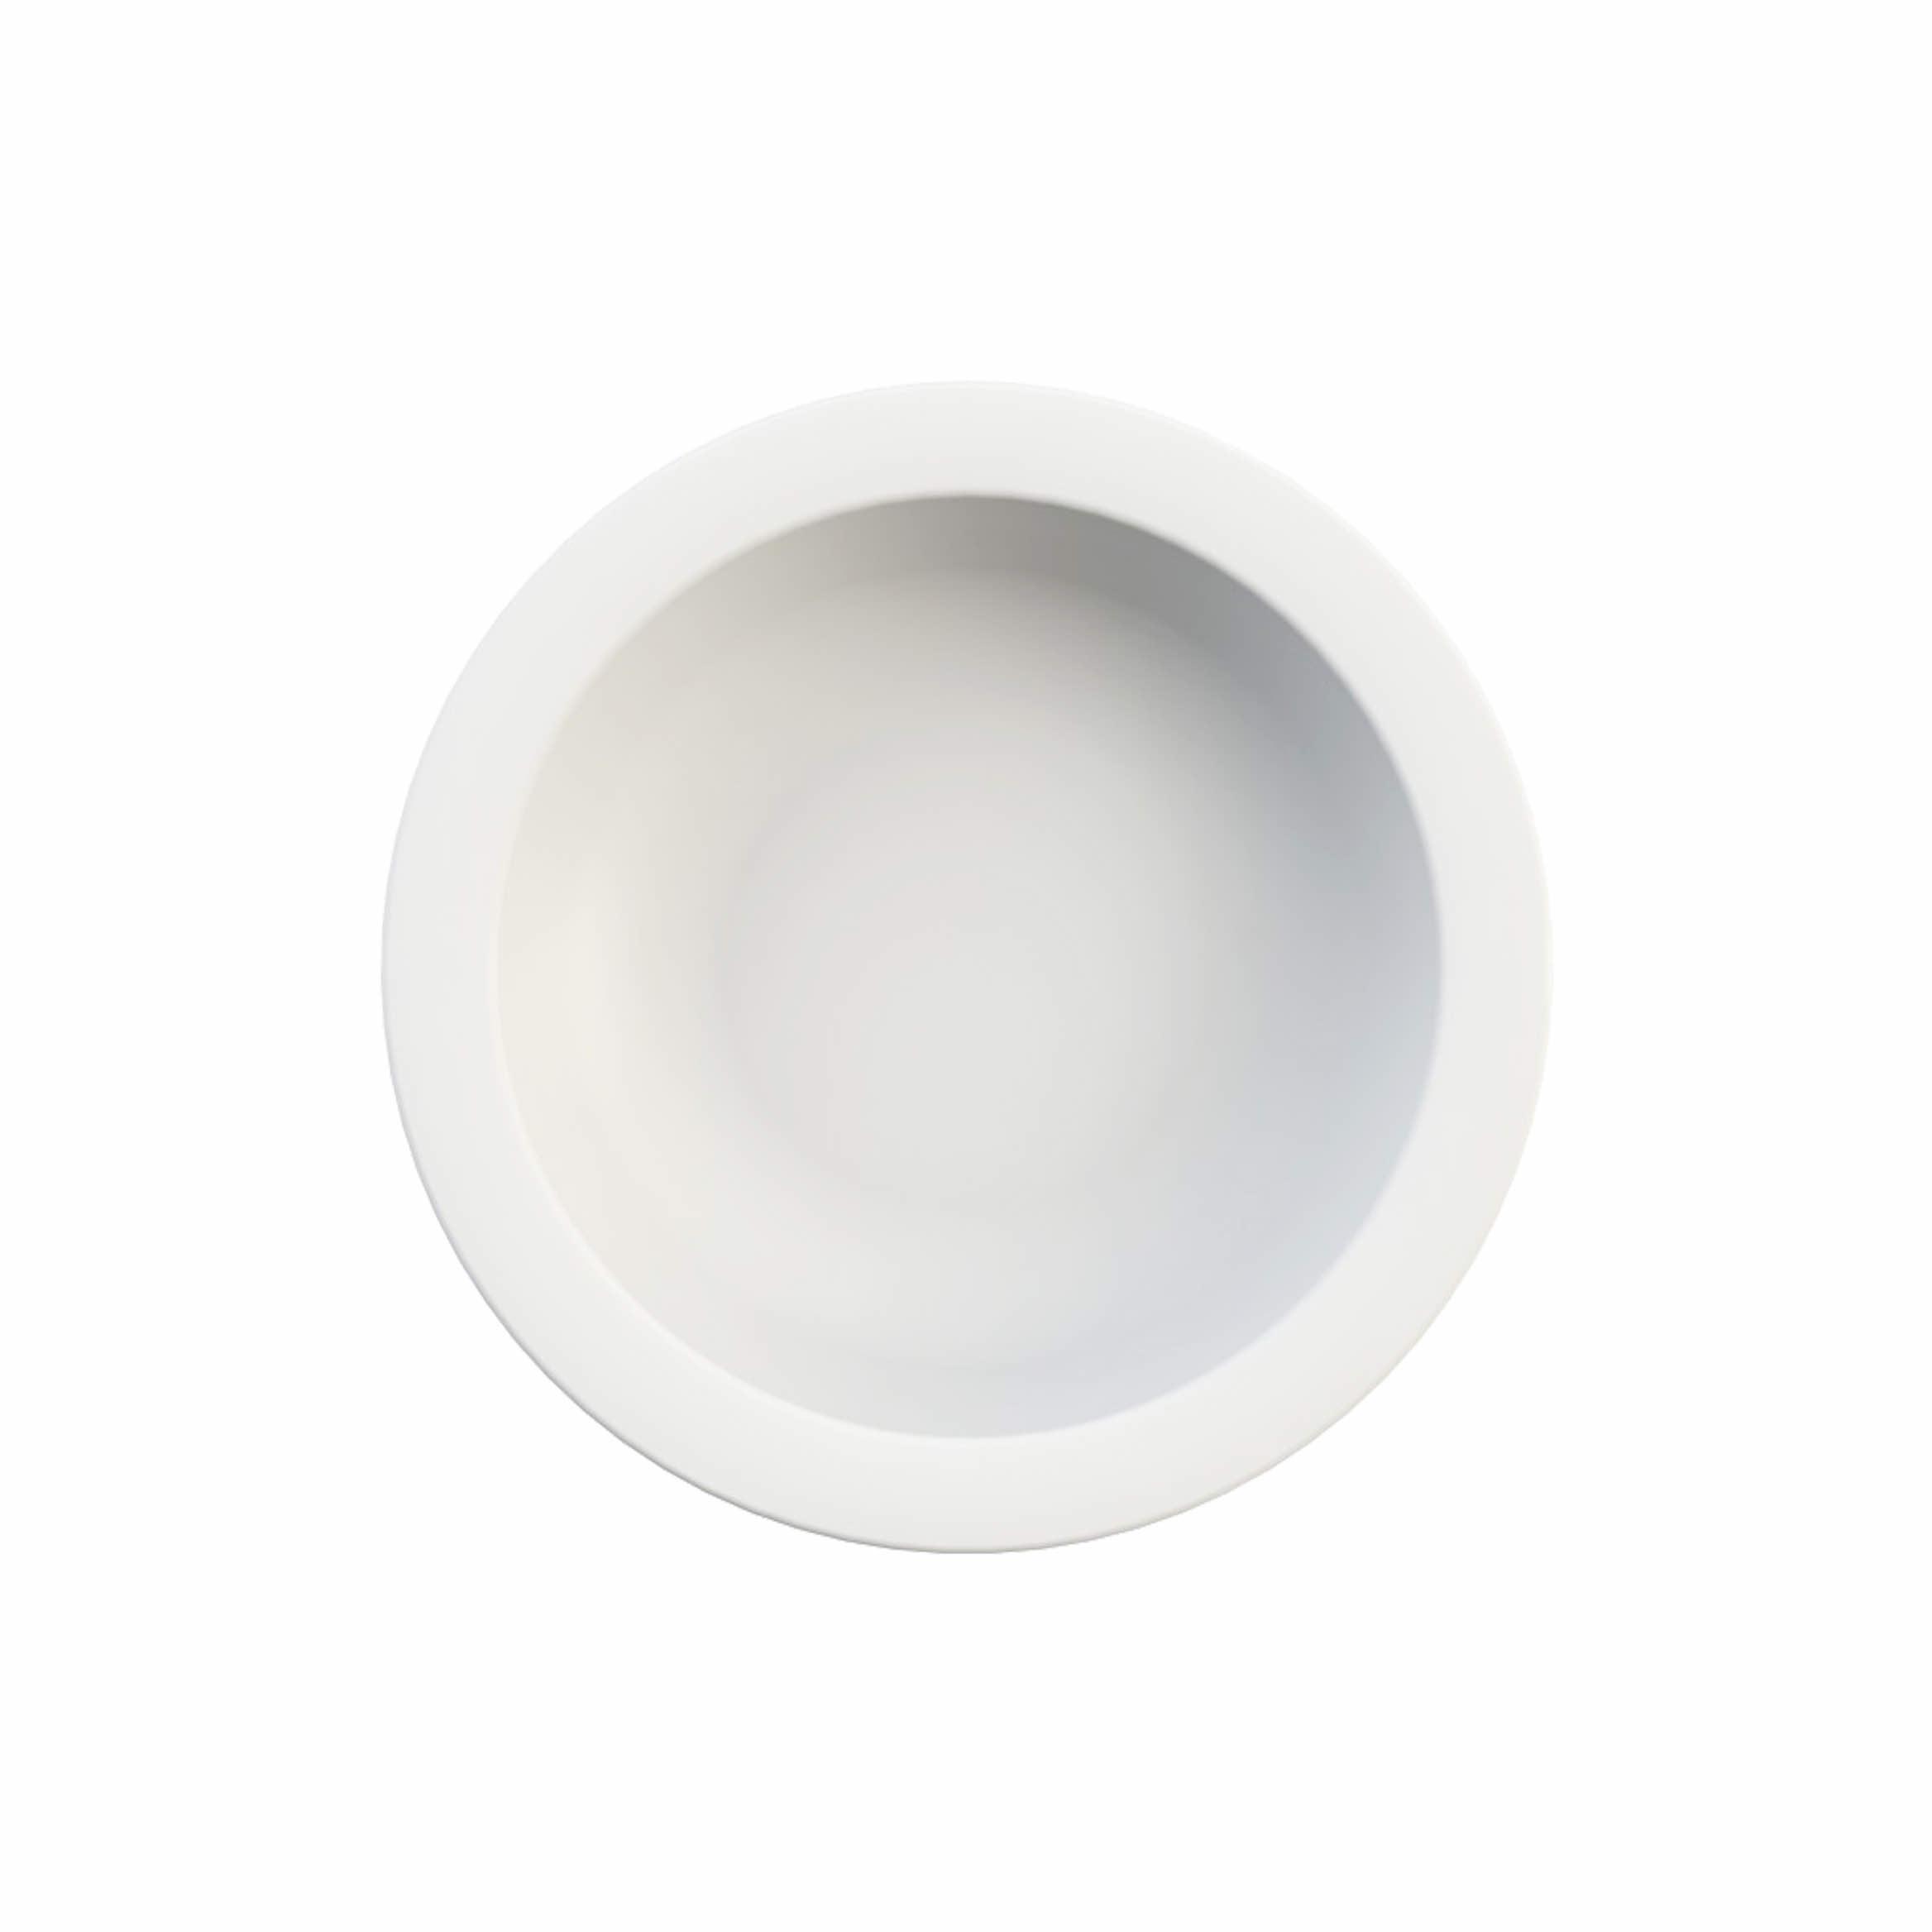 WACA Teller tief PBT 500 ml